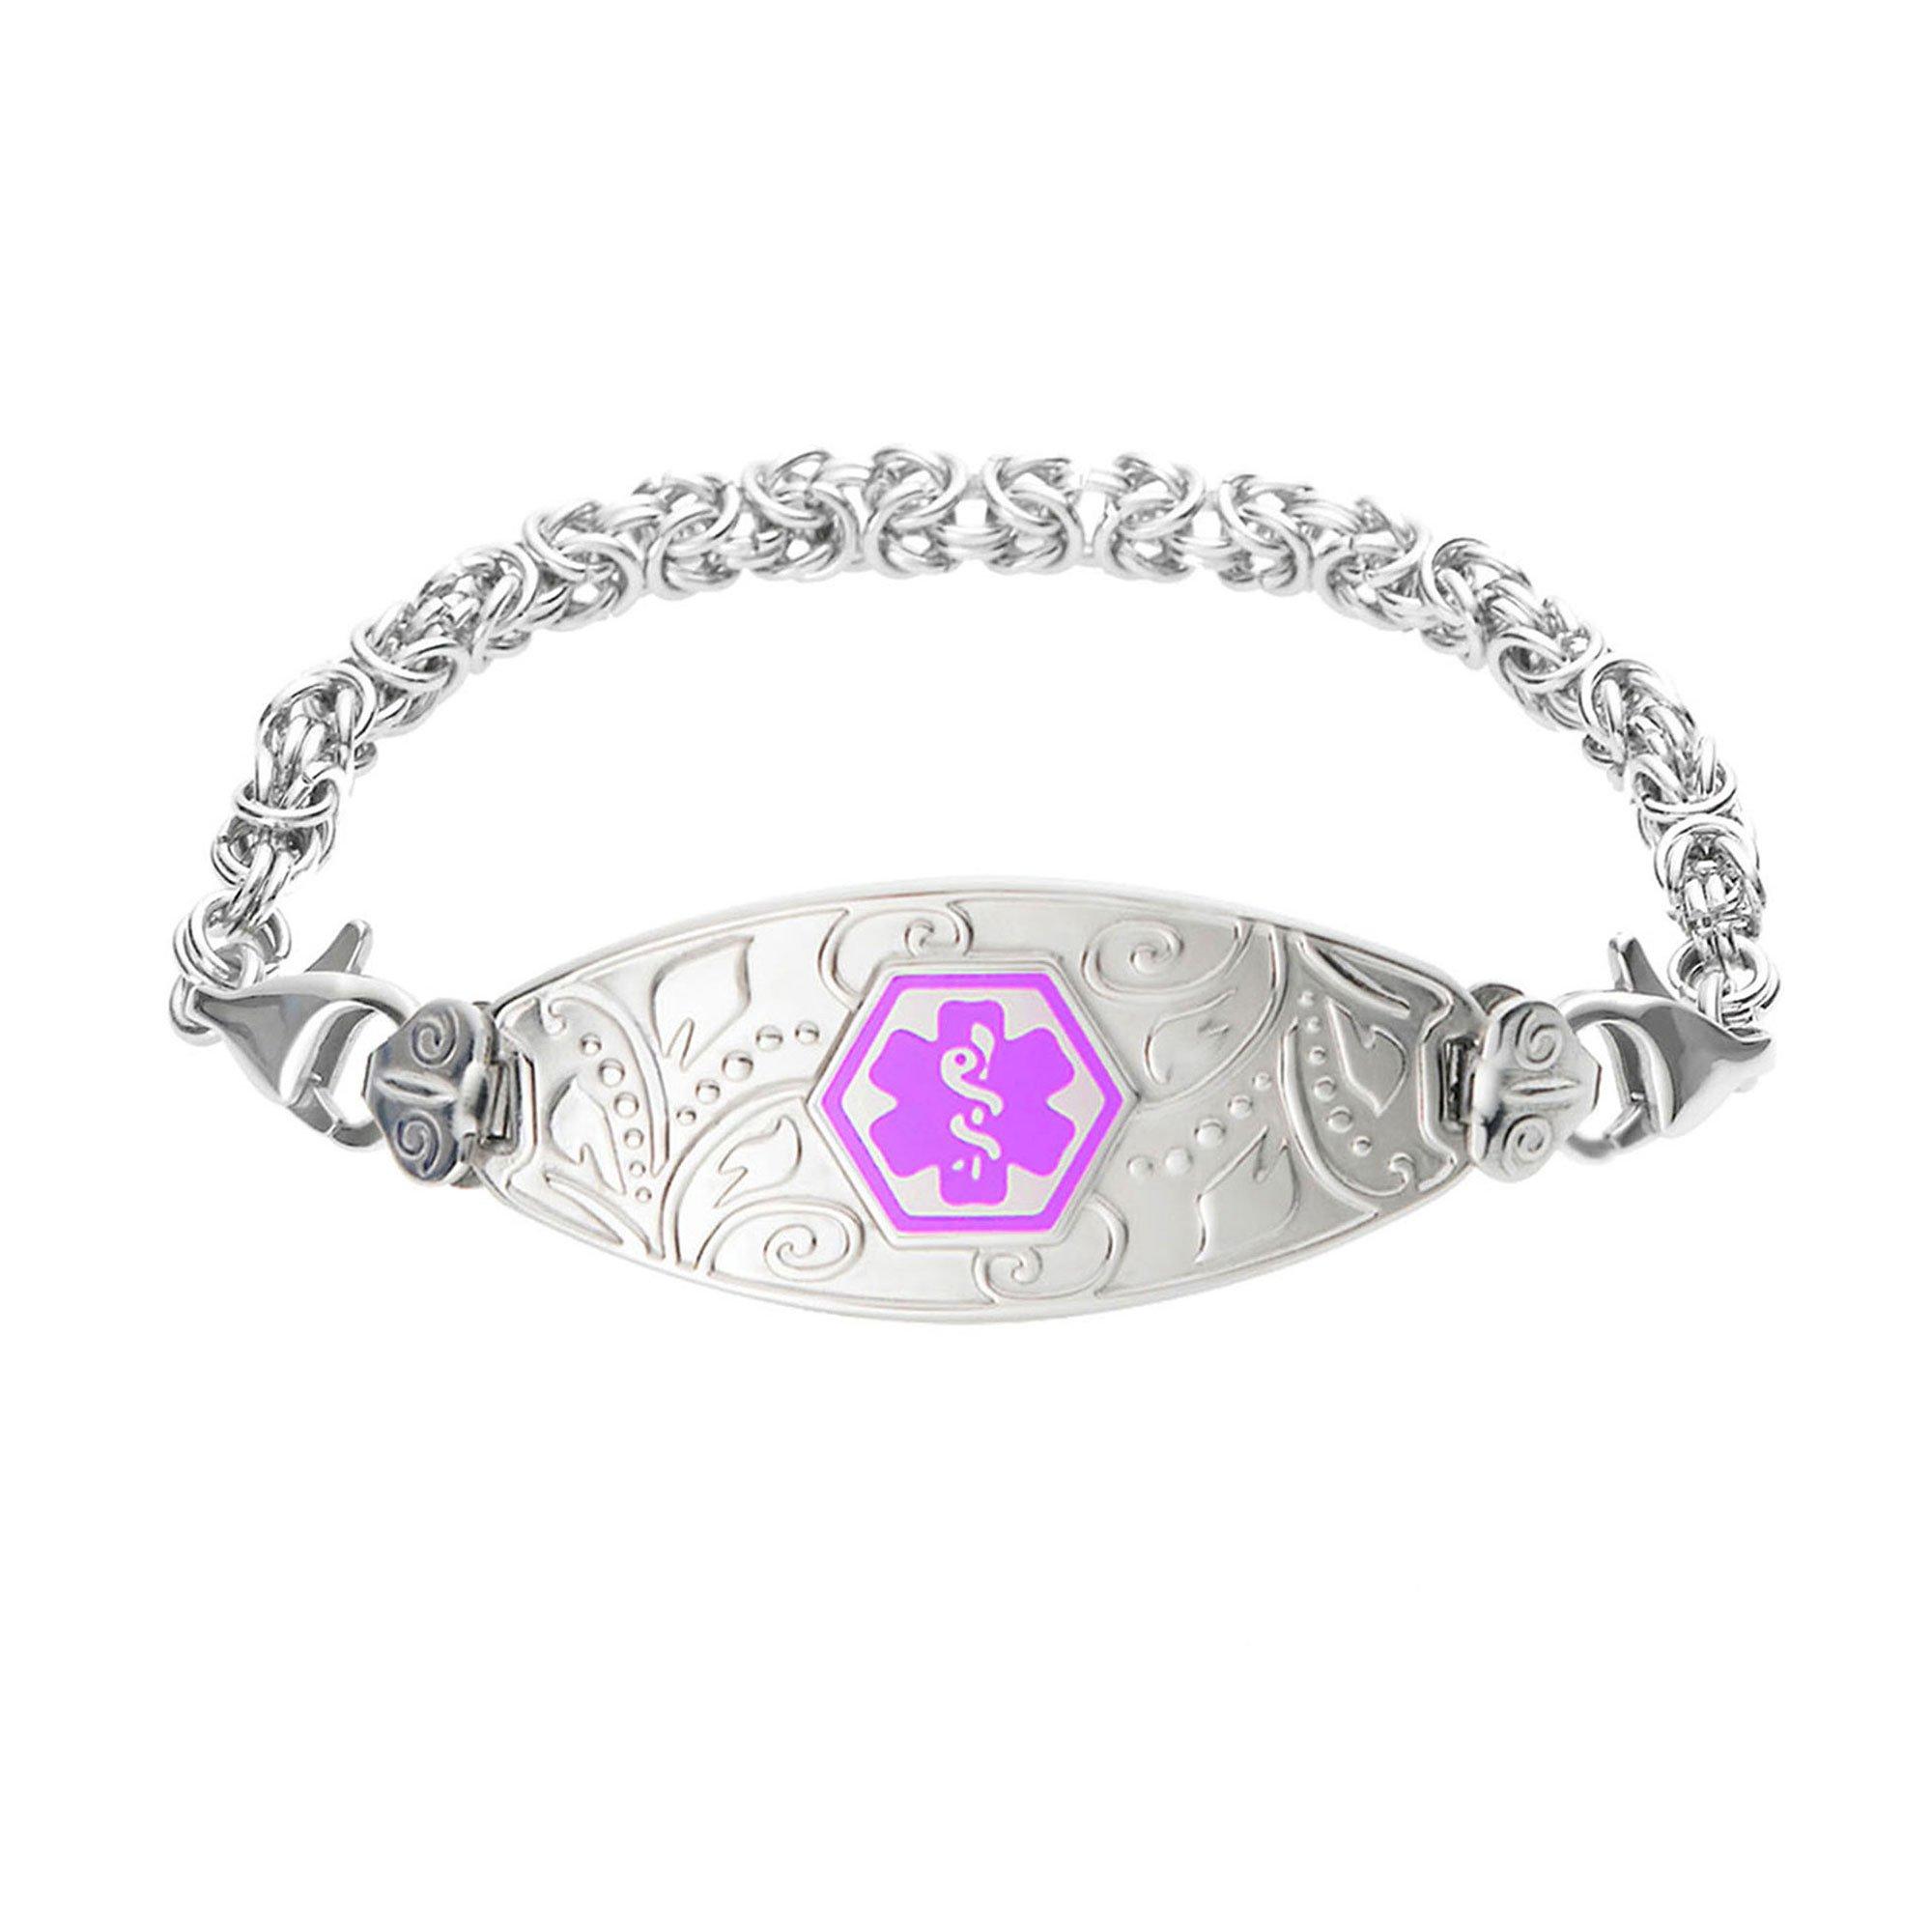 Divoti Custom Engraved Lovely Filigree Medical Alert Bracelet -Handmade Byzantine-Purple-6.5'' by Divoti (Image #1)